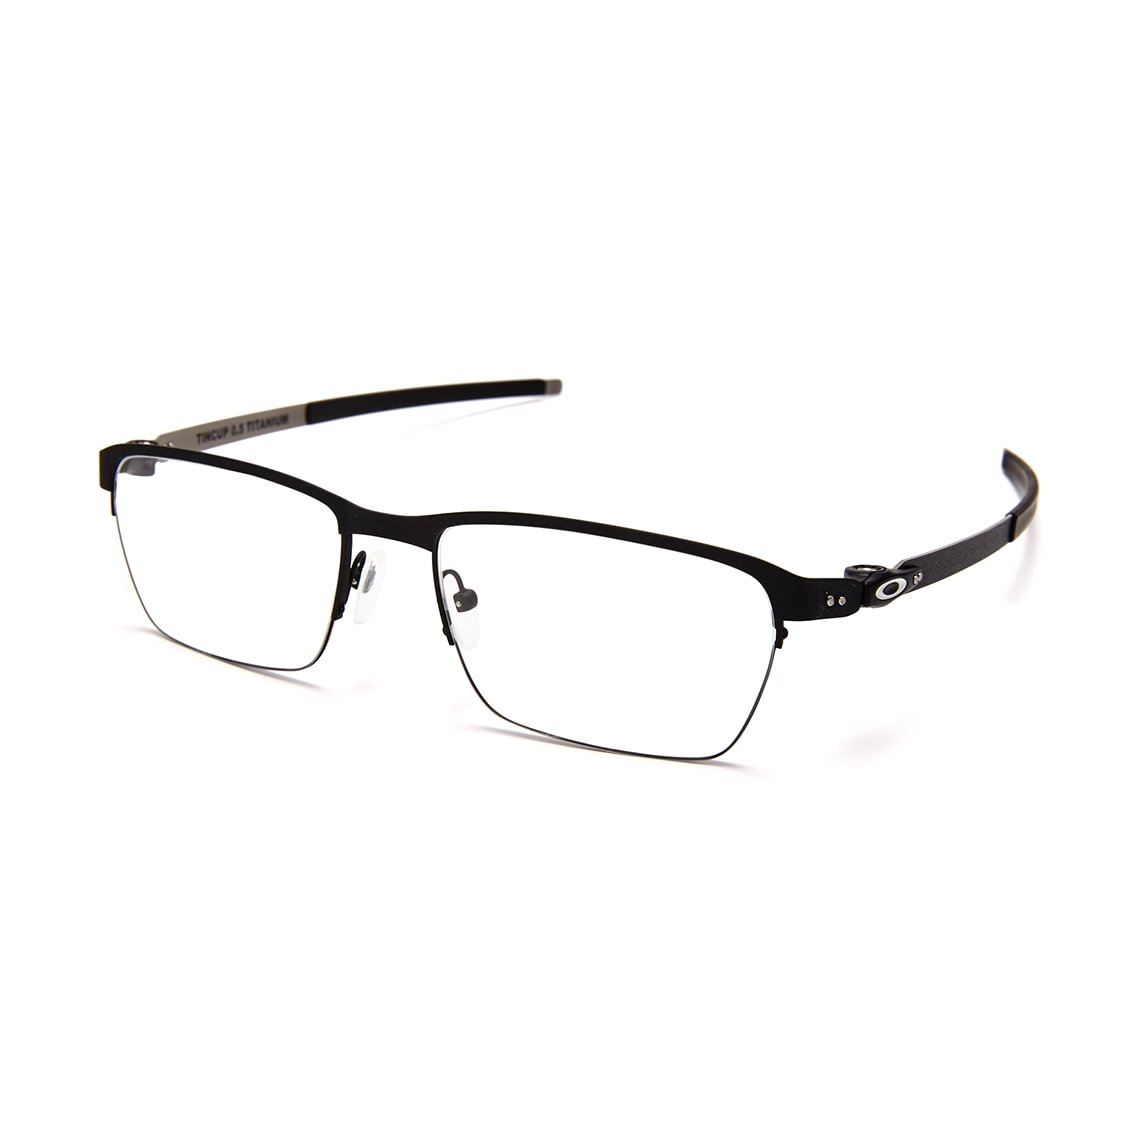 Oakley Tincup 0.5 Titanium OX5099 01